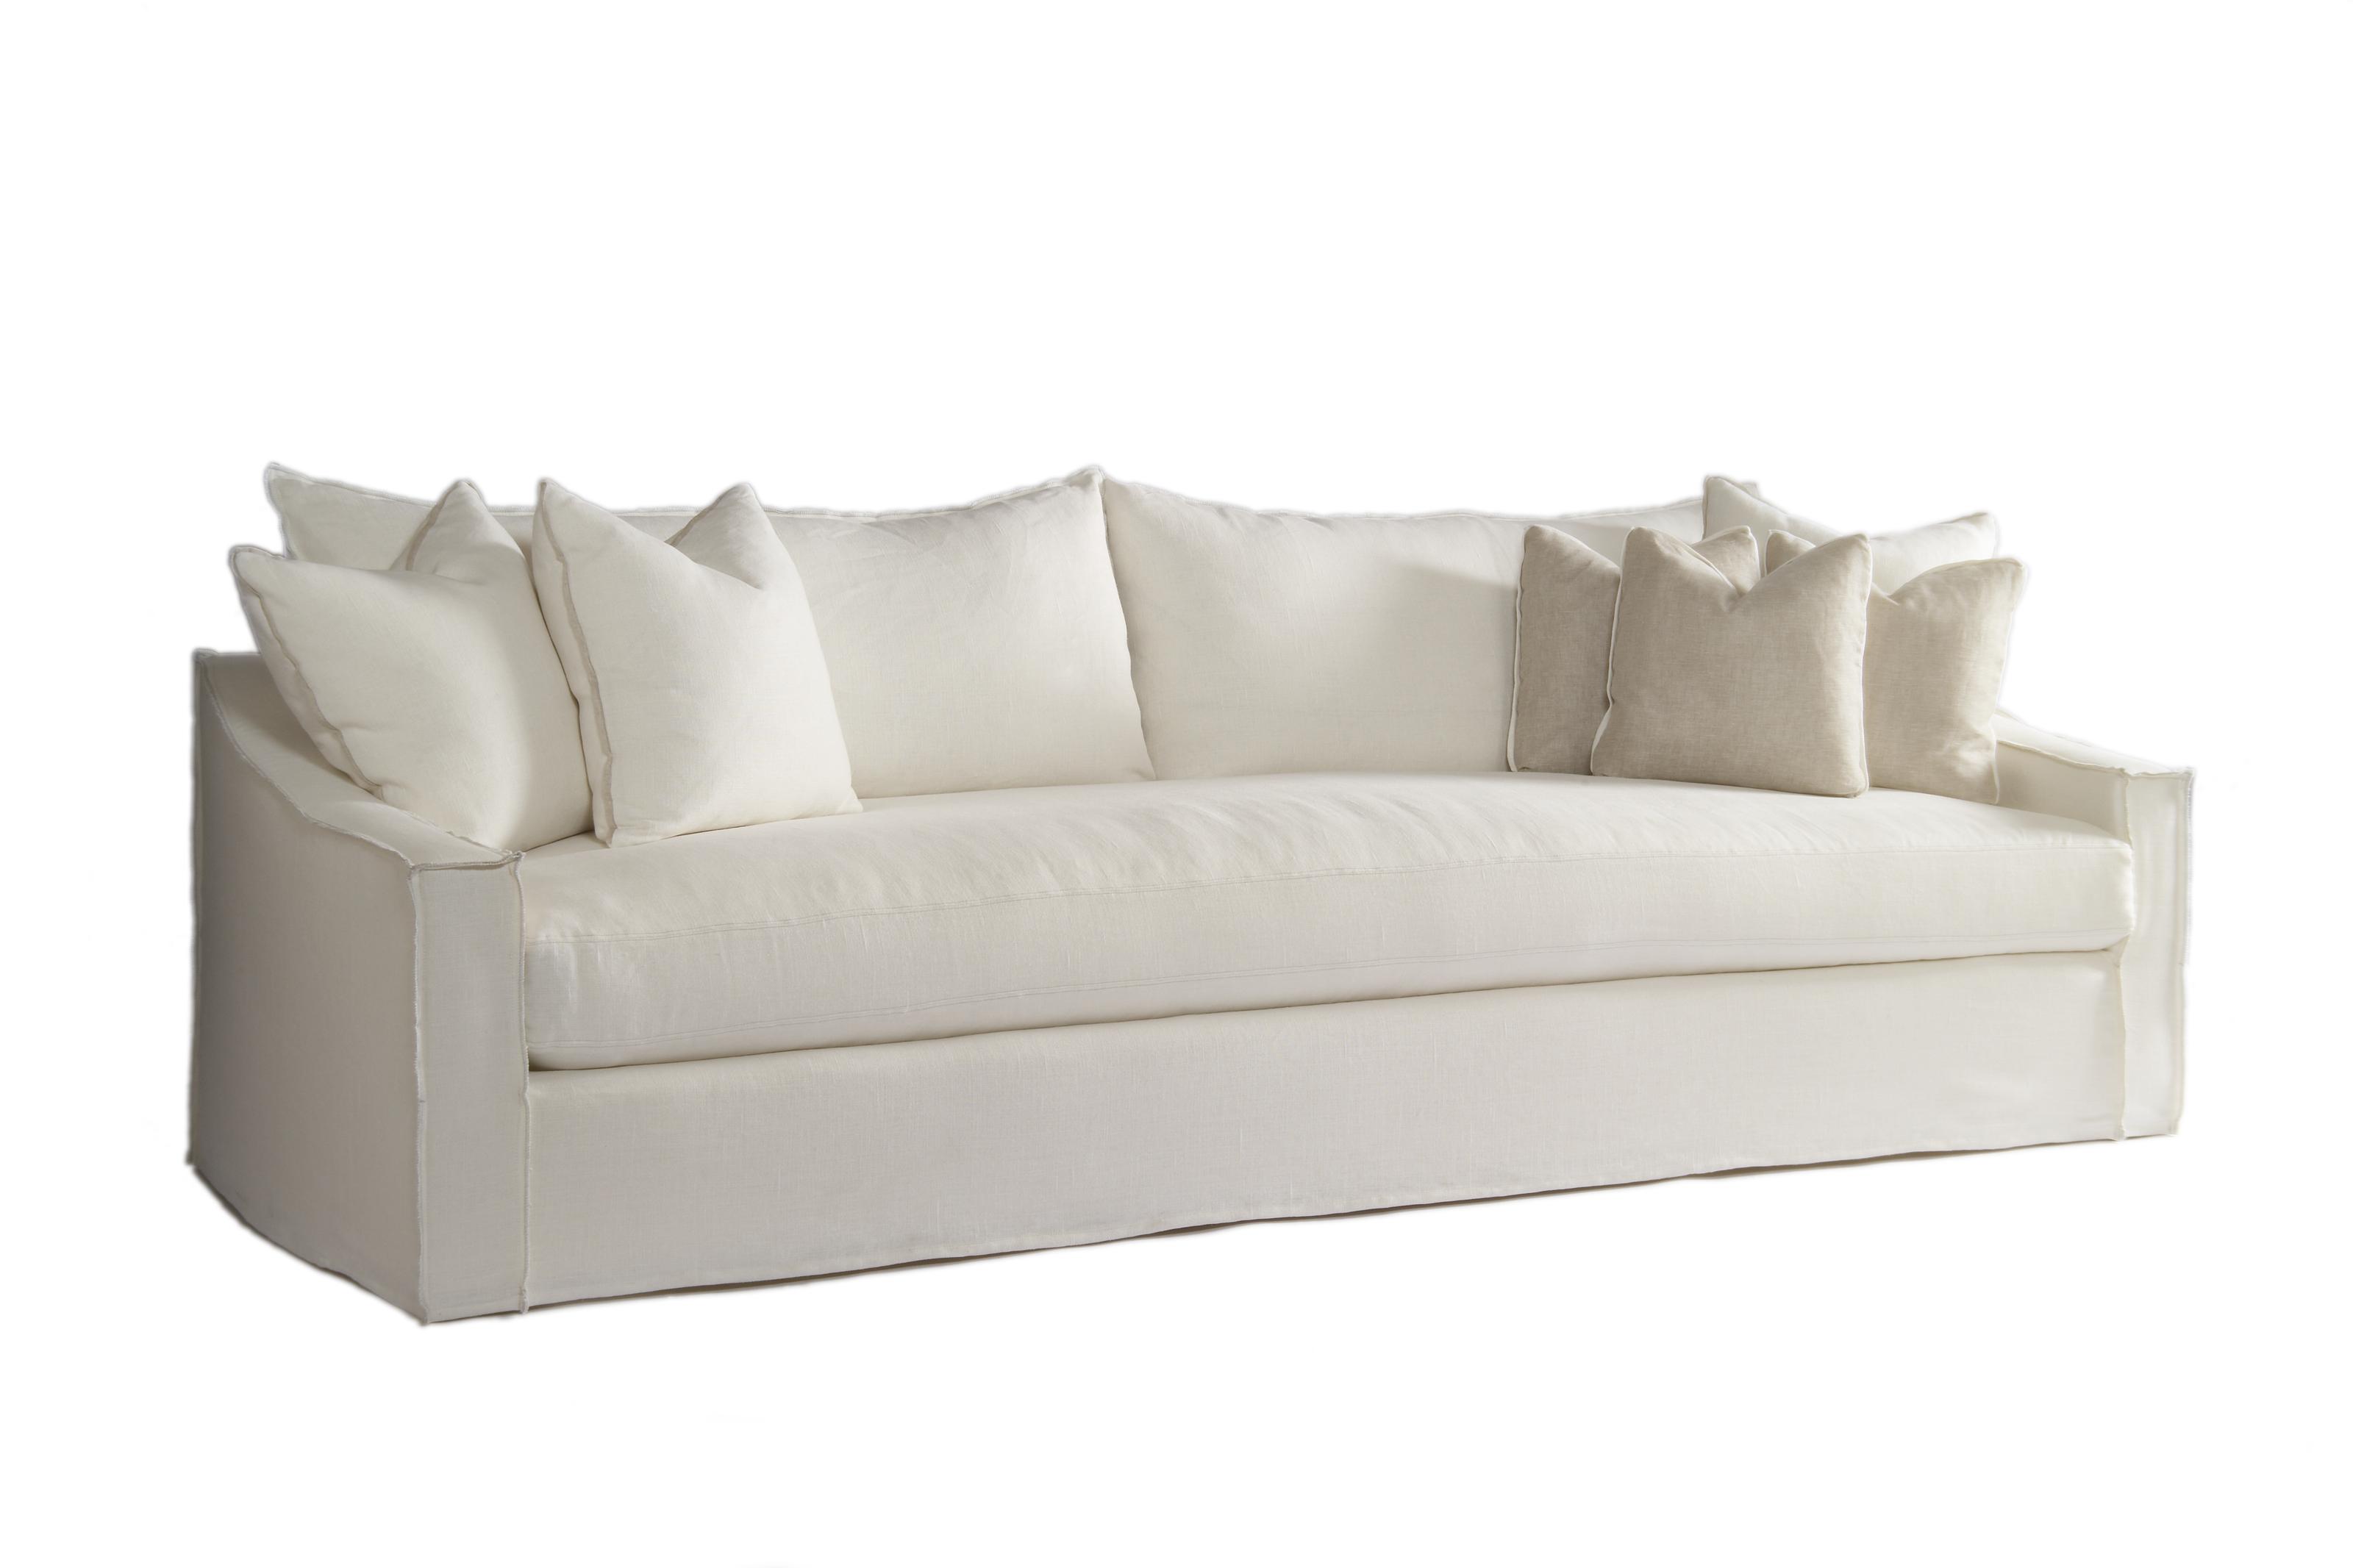 linen slipcovered sofa for small living room design absolutely verellen  artefact home garden